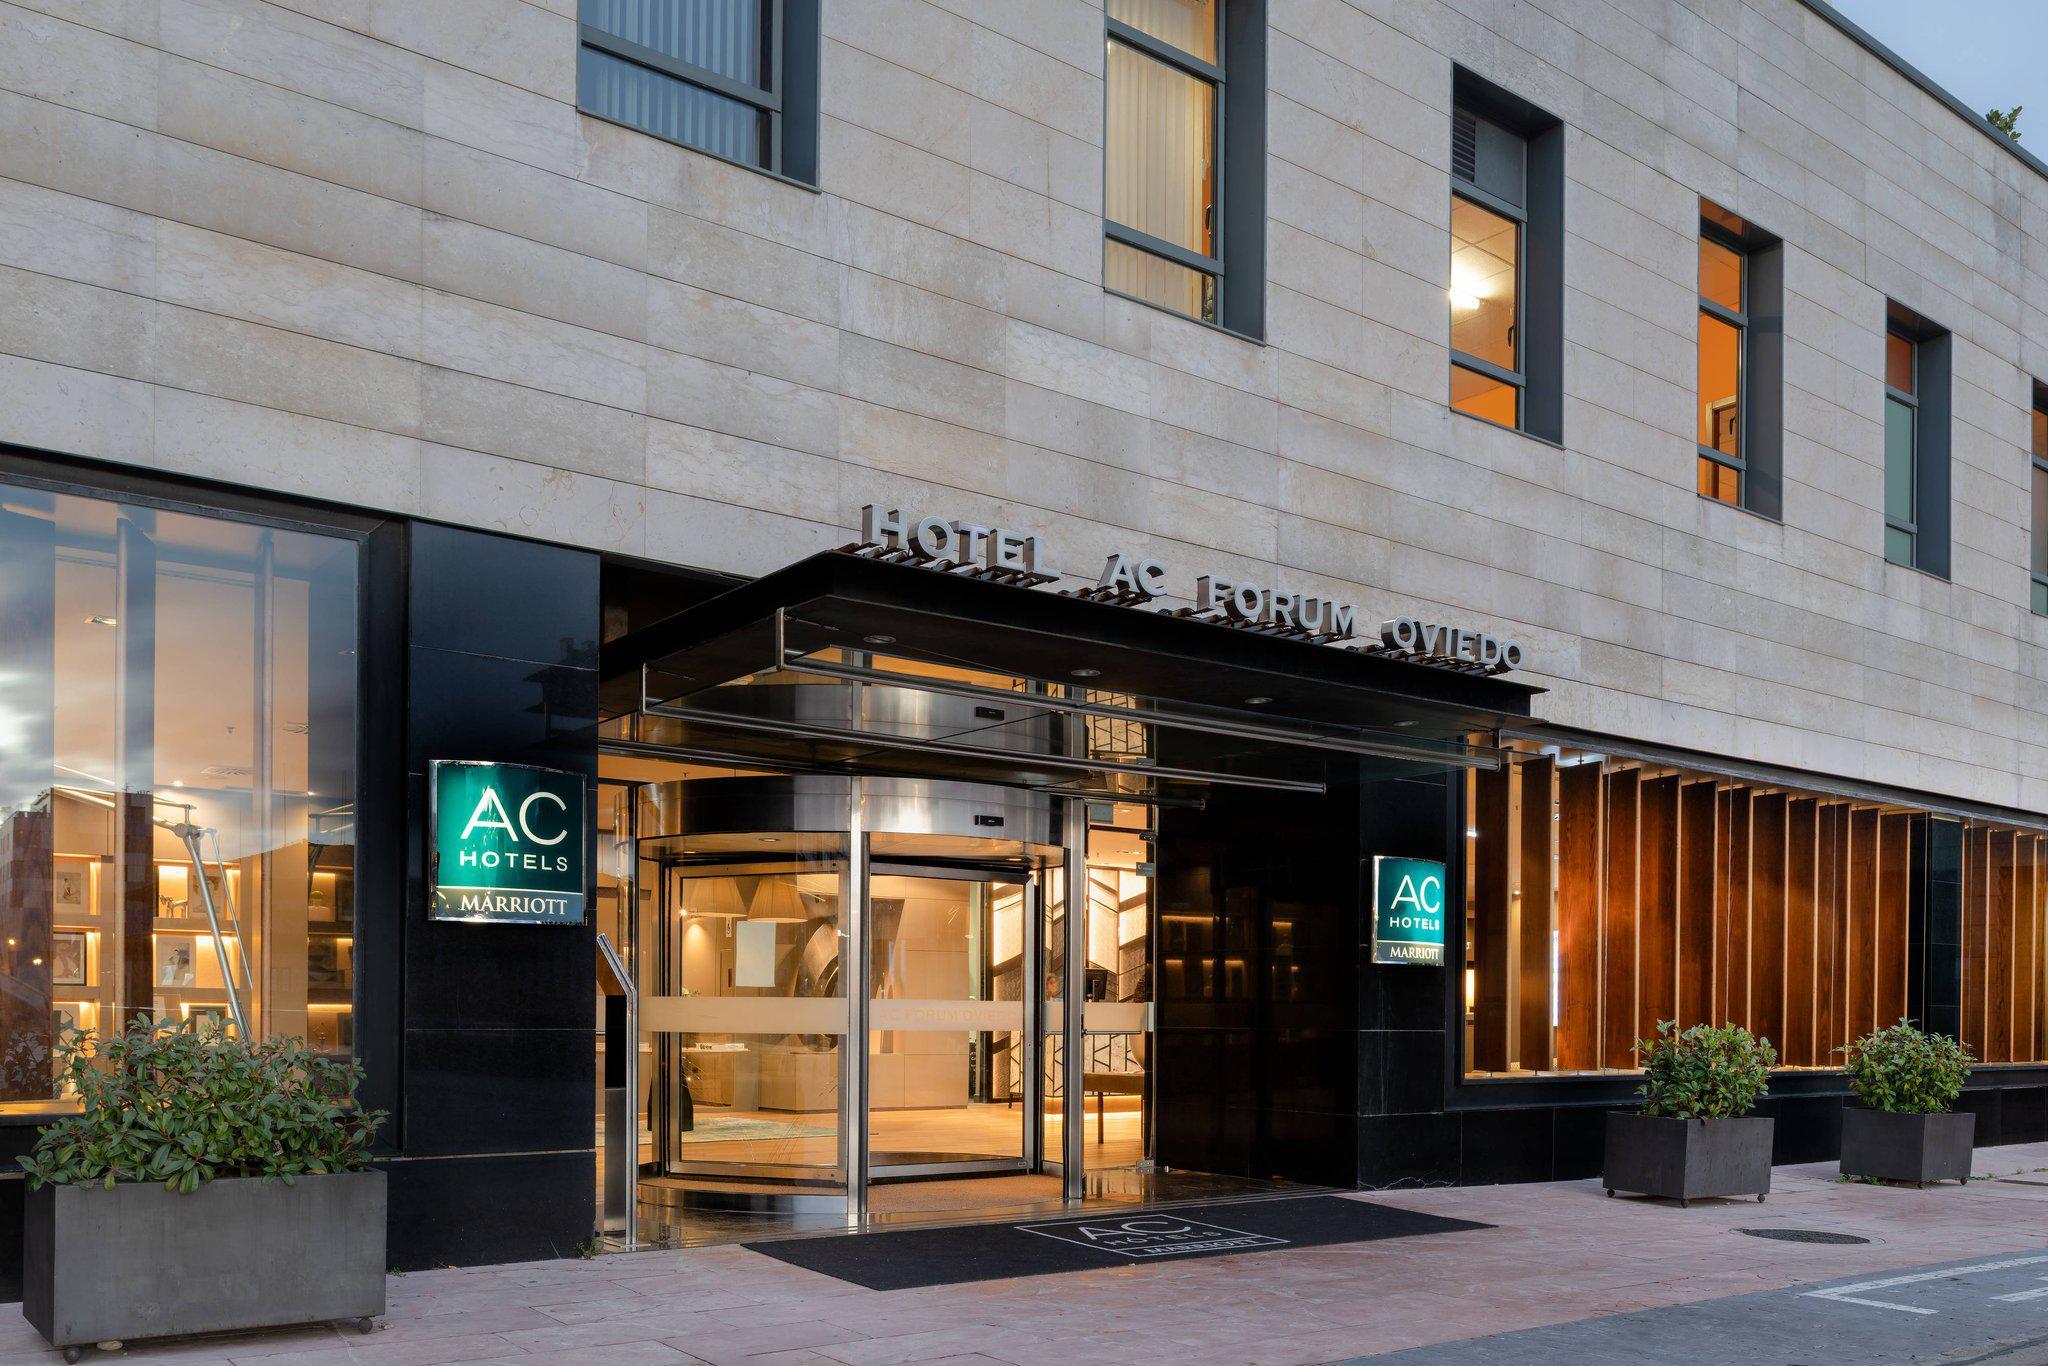 AC Hotel by Marriott Oviedo Forum